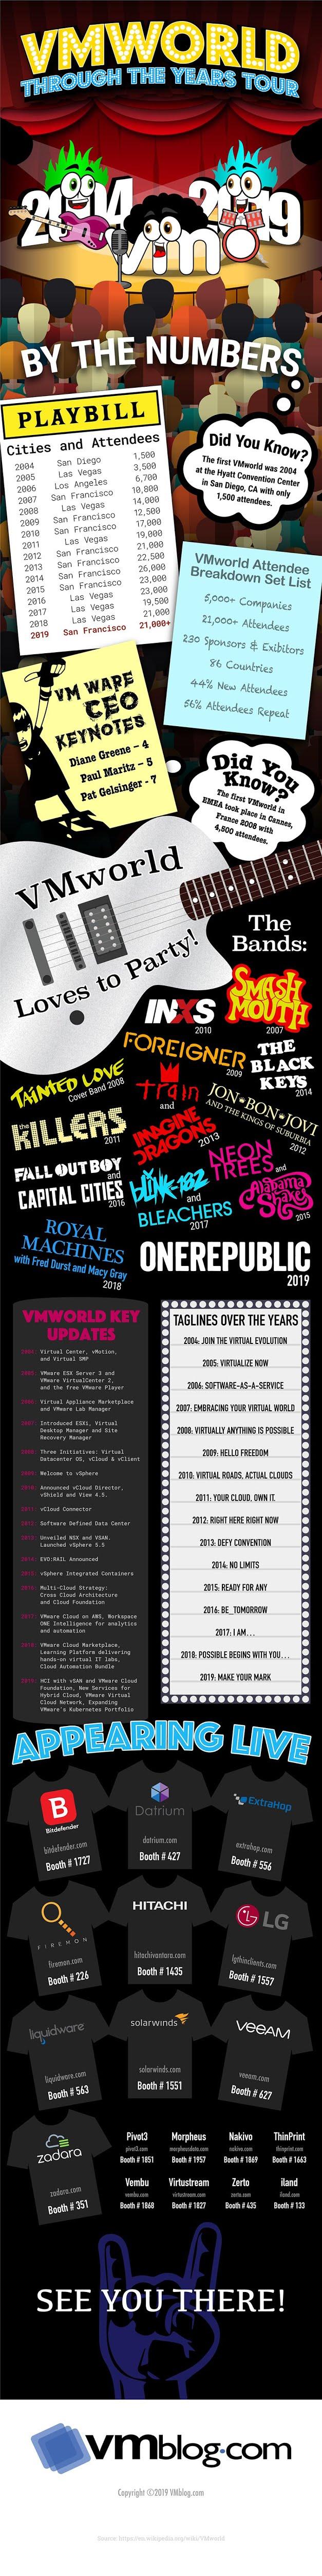 VMworld Through the Years Tour 2004 to 2019 #infographic